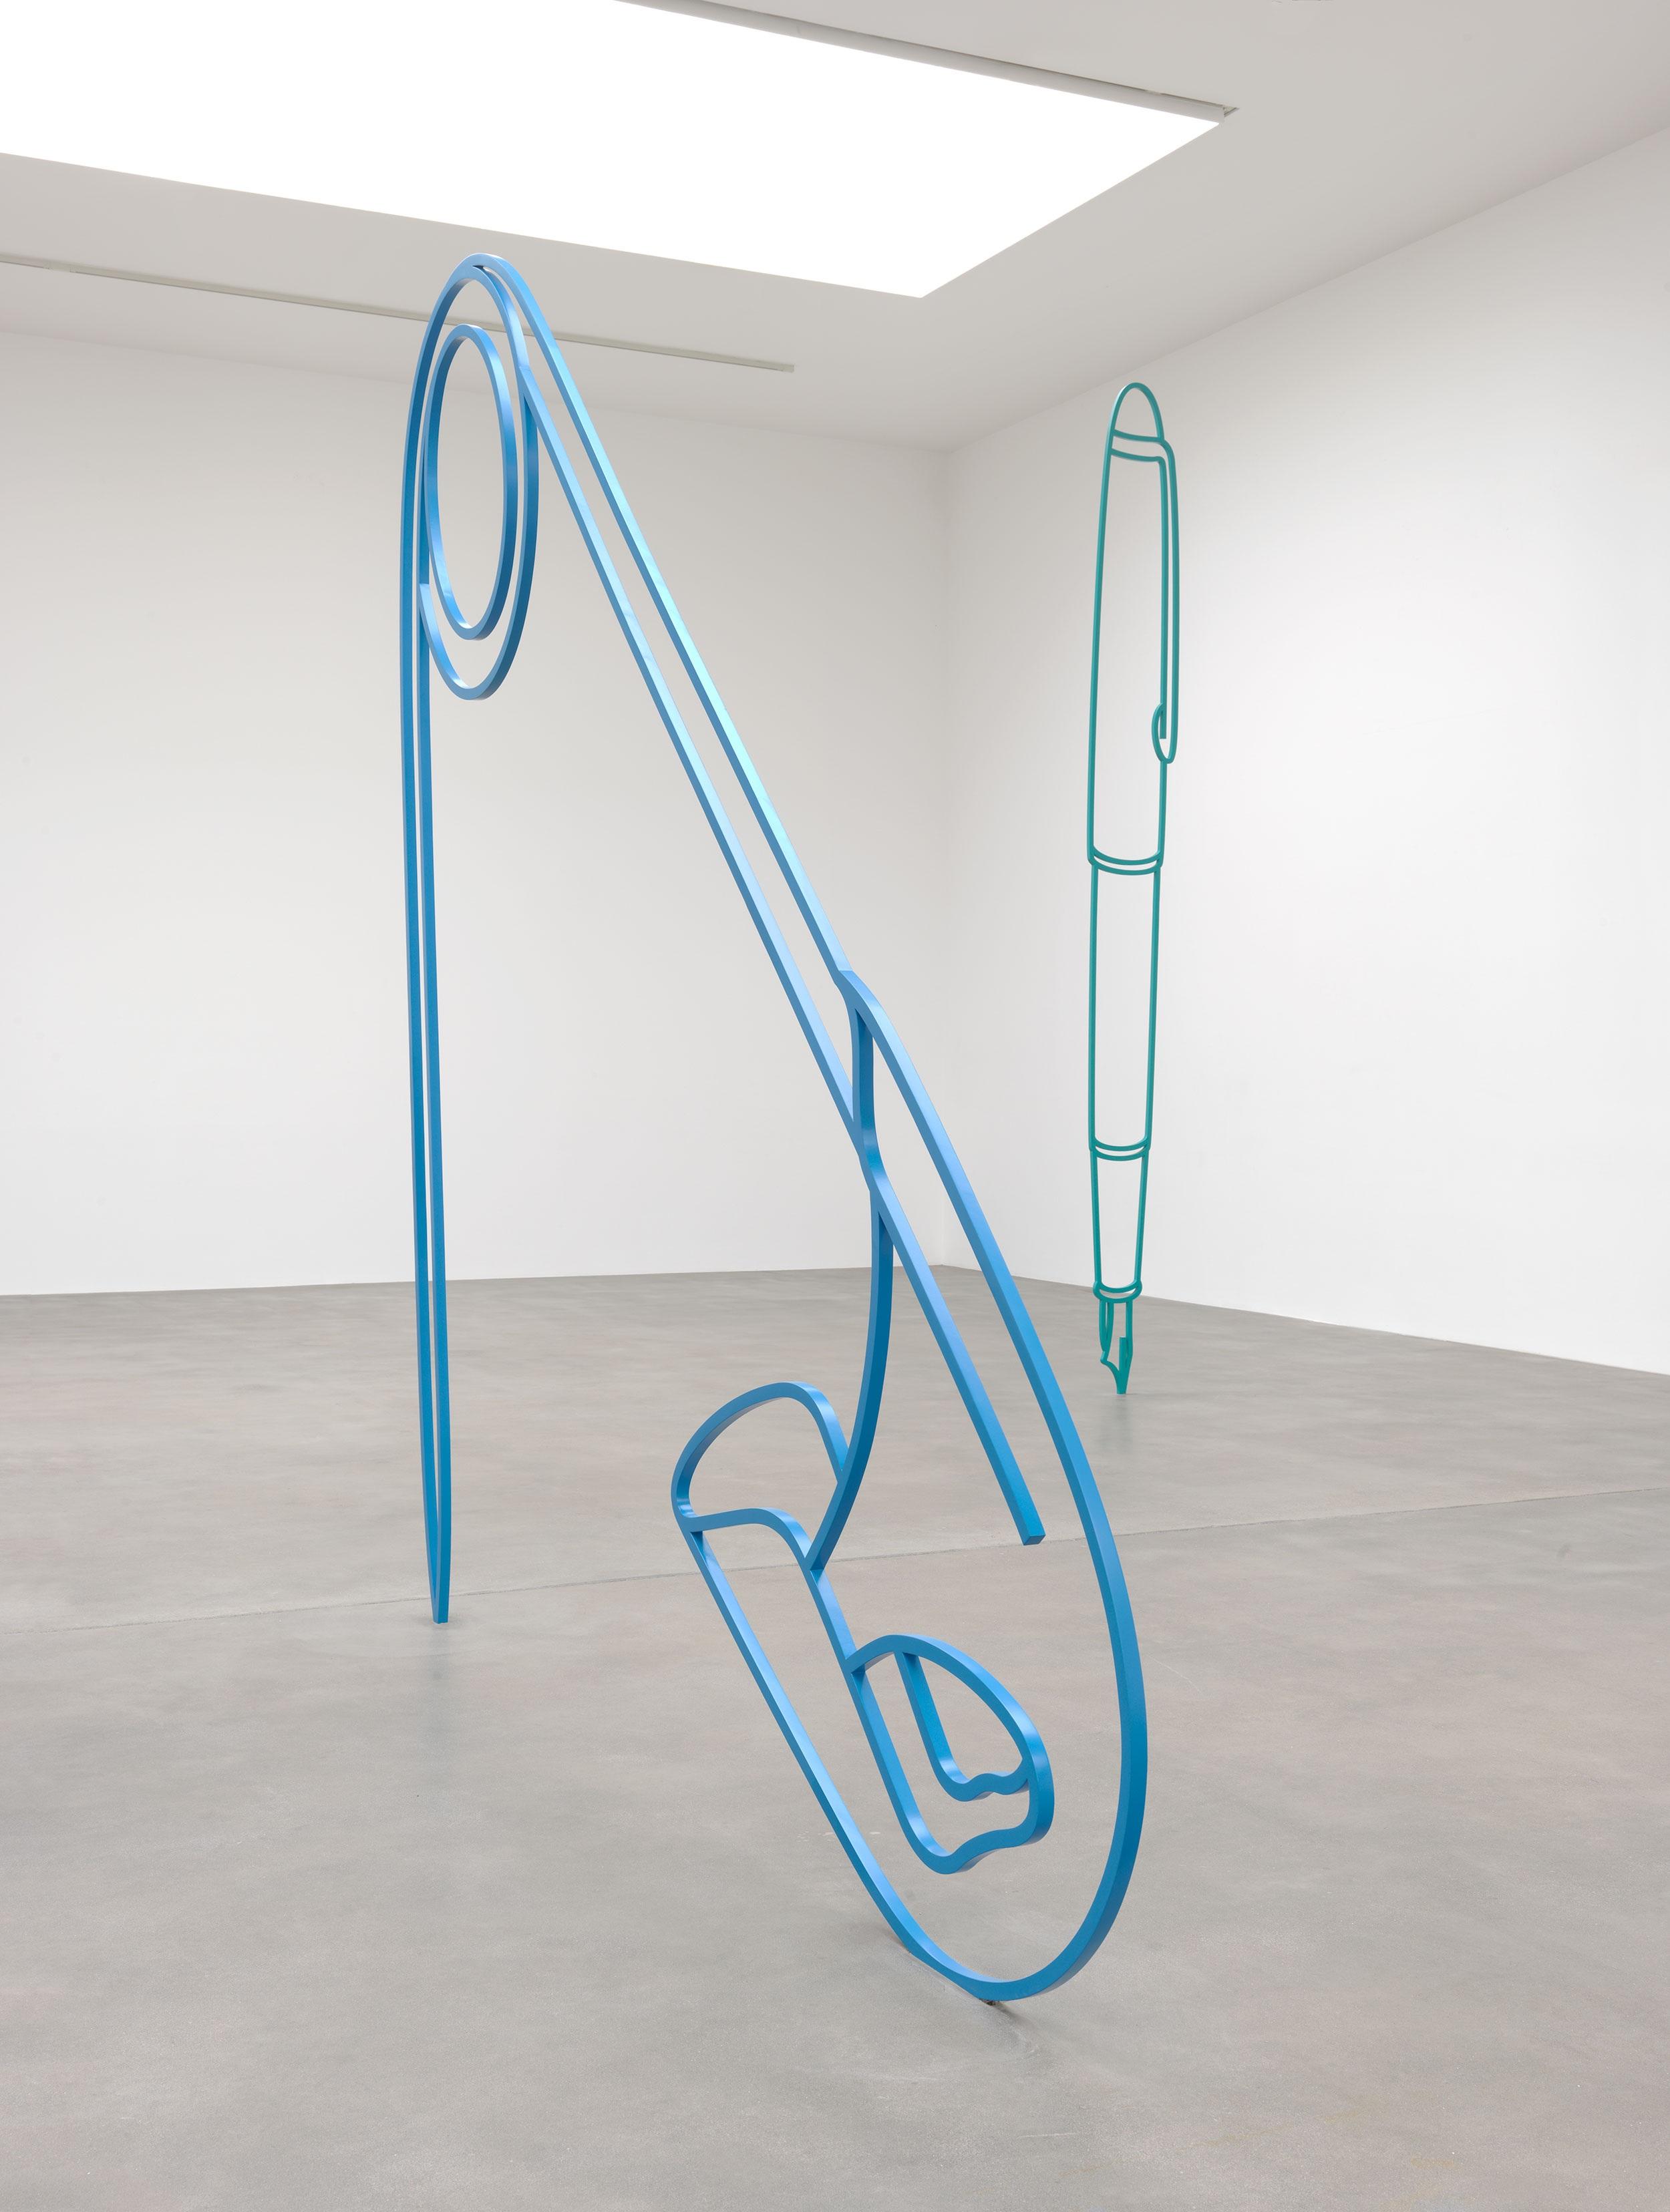 CRAIG-2019-Sculpture-Installation-view-E.jpg